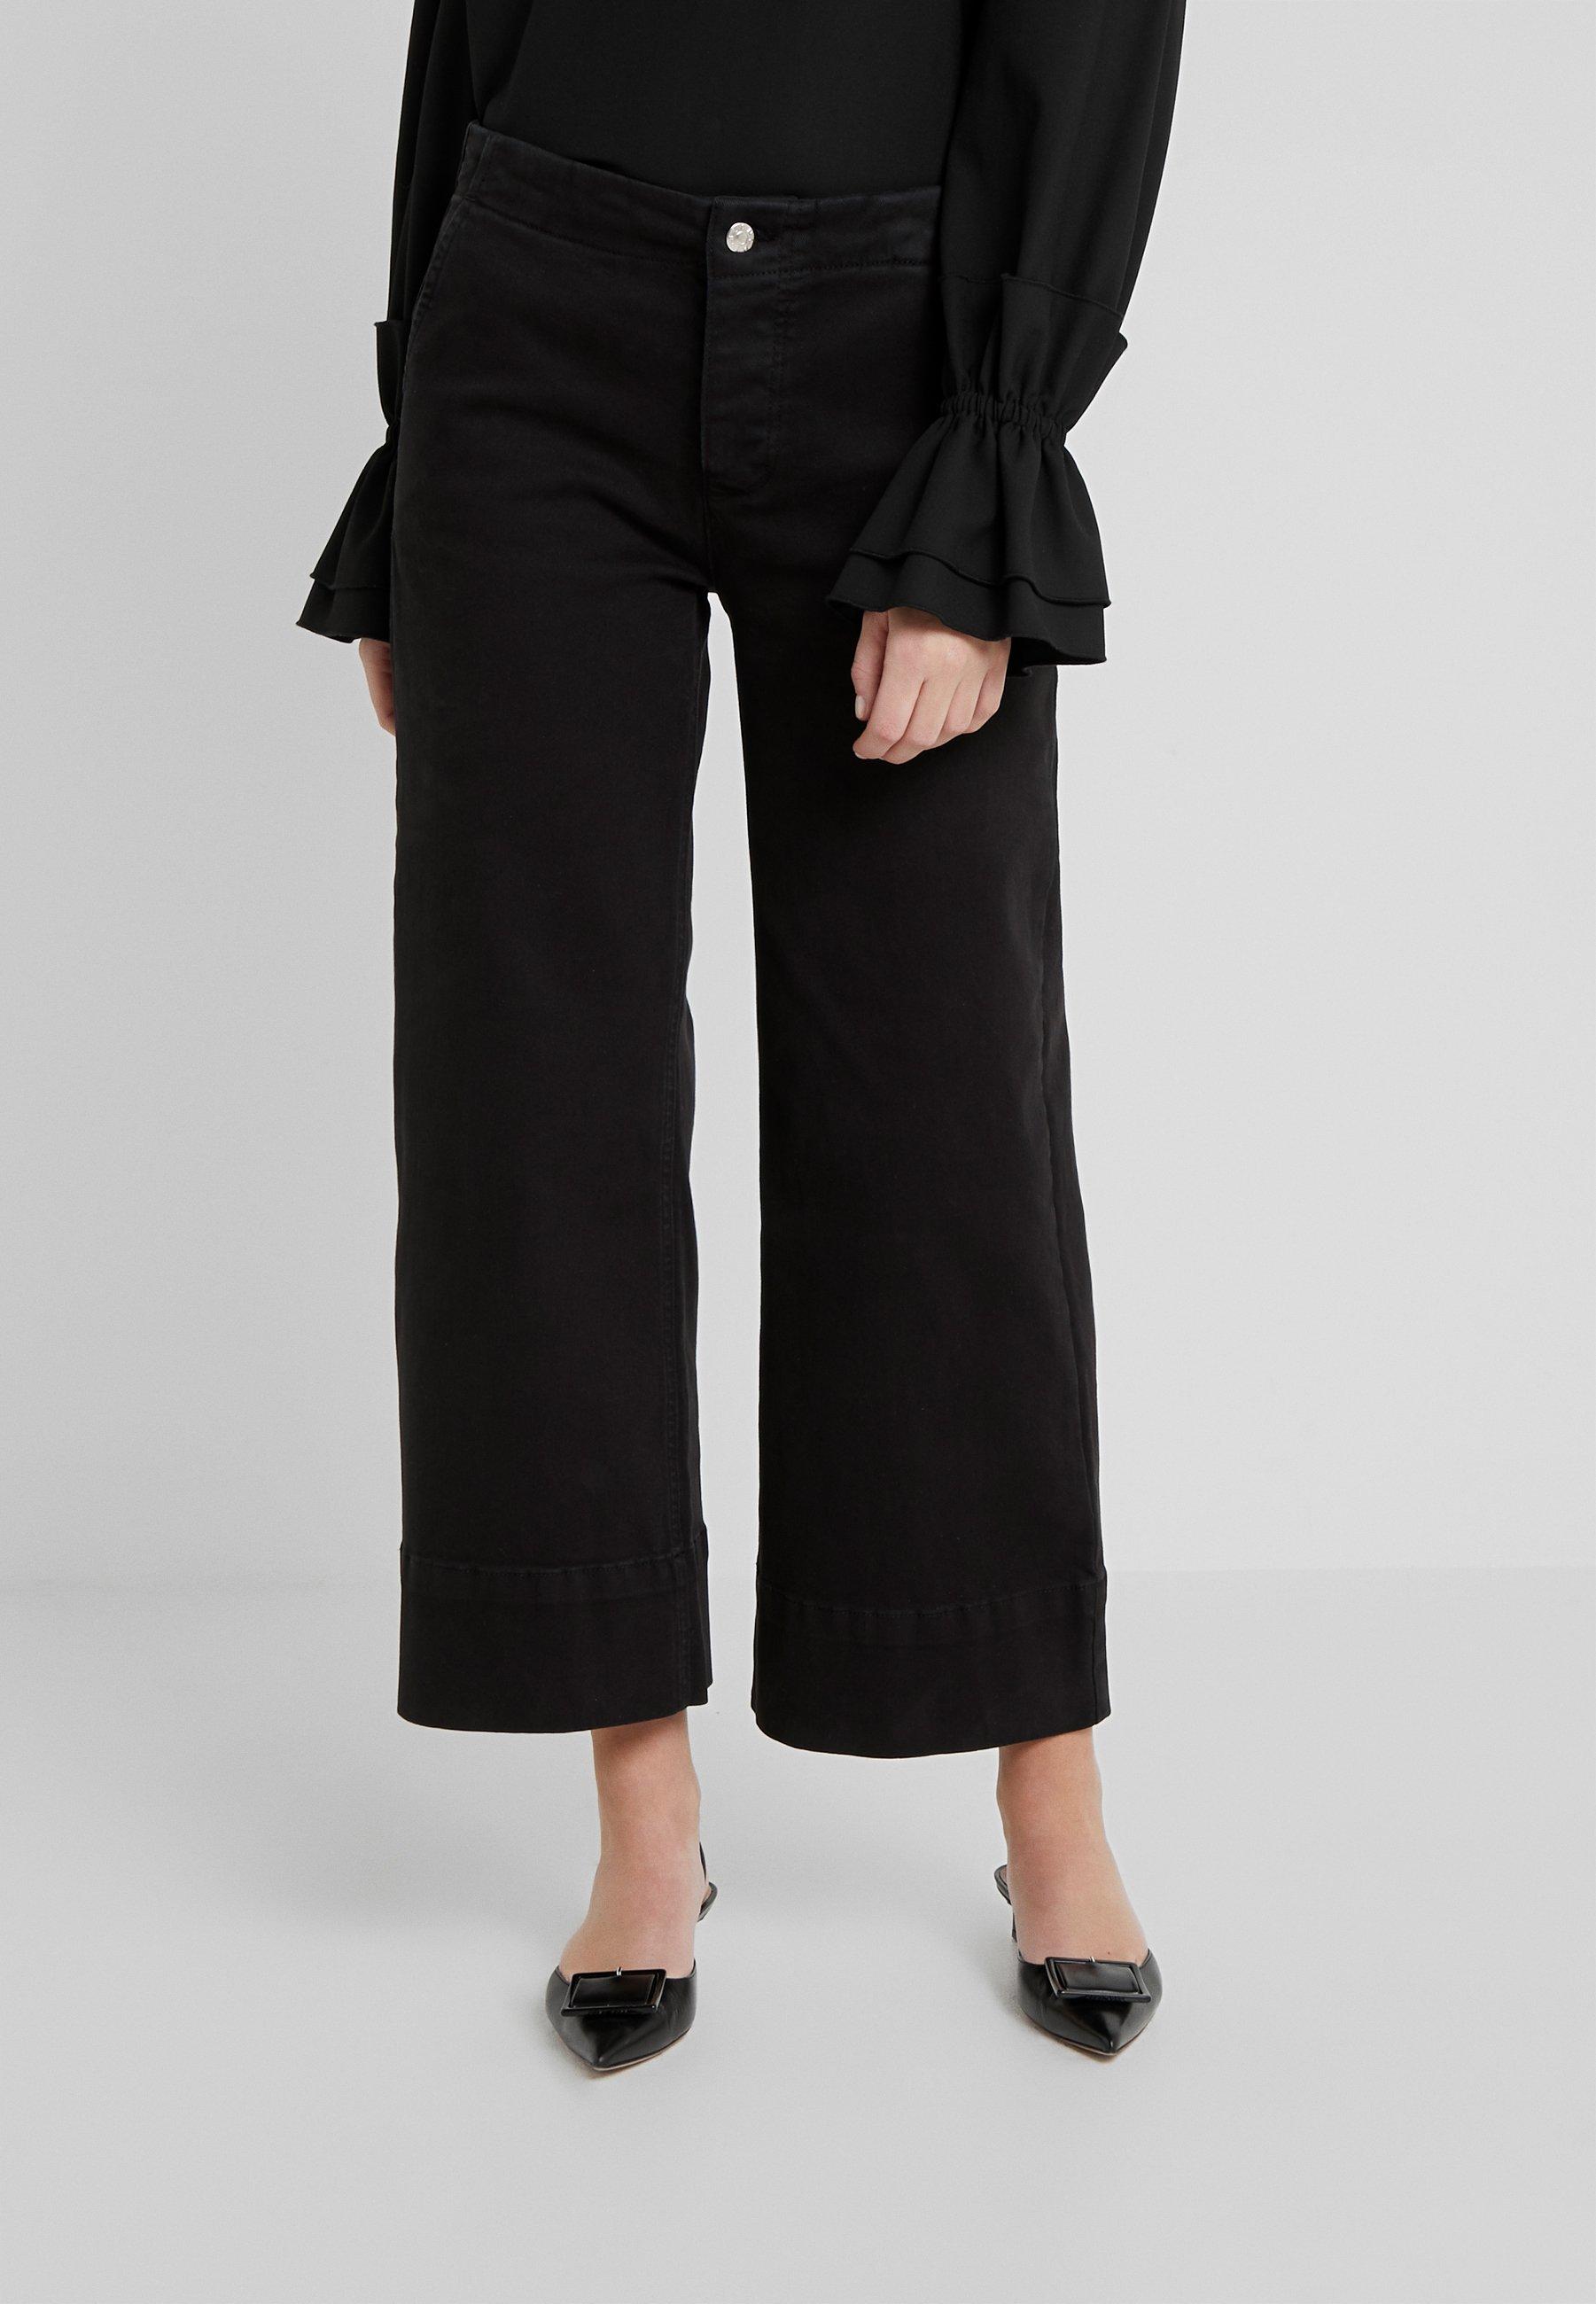 Blanche Action Pants - Kangashousut Black